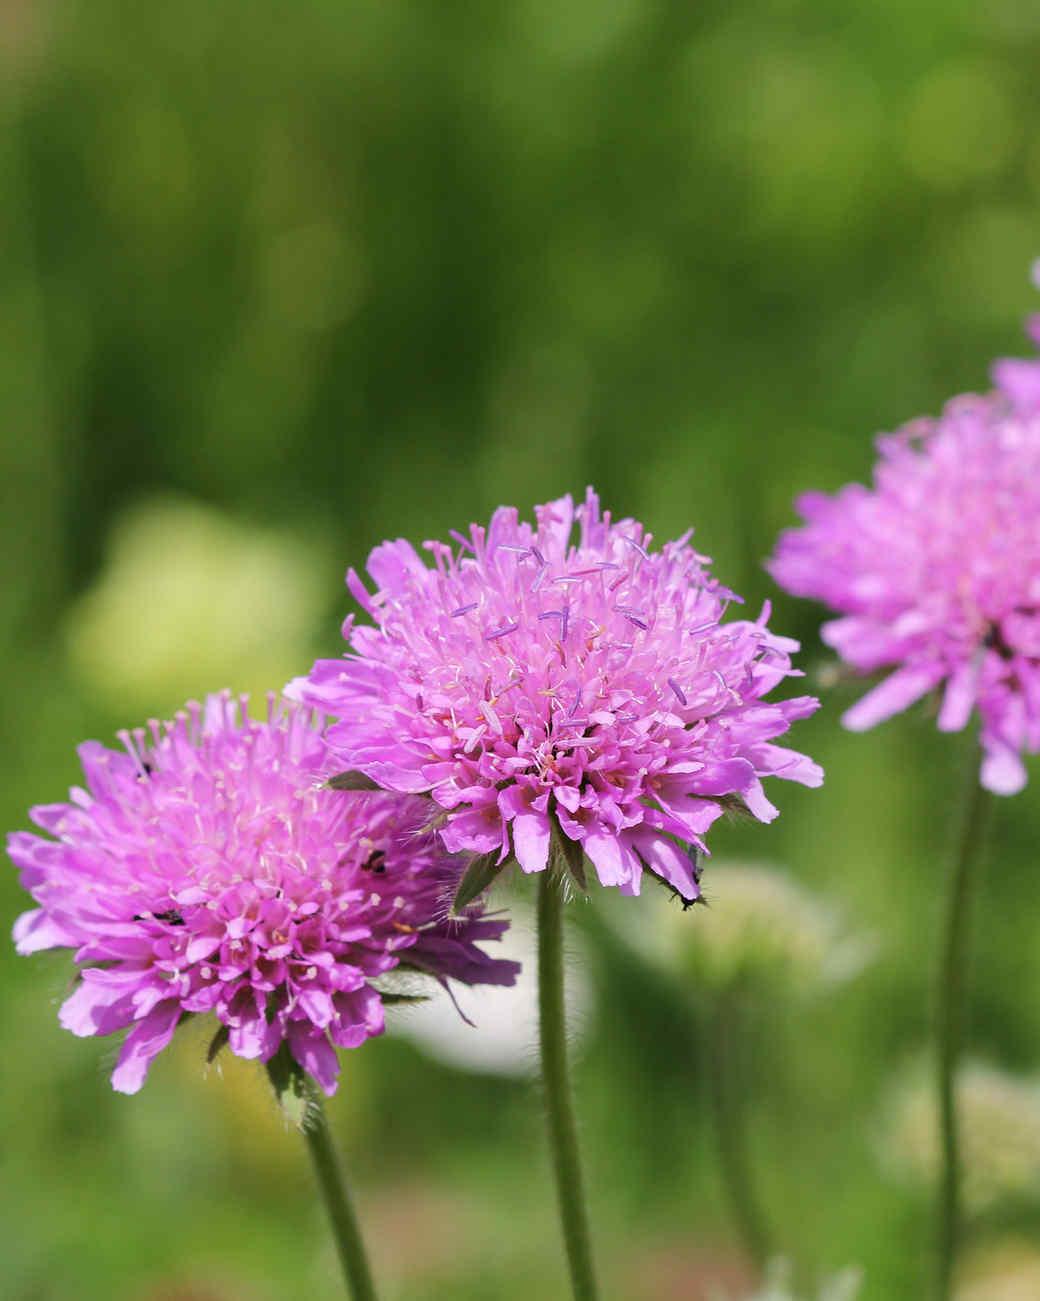 pink scabiosa flowers in grass